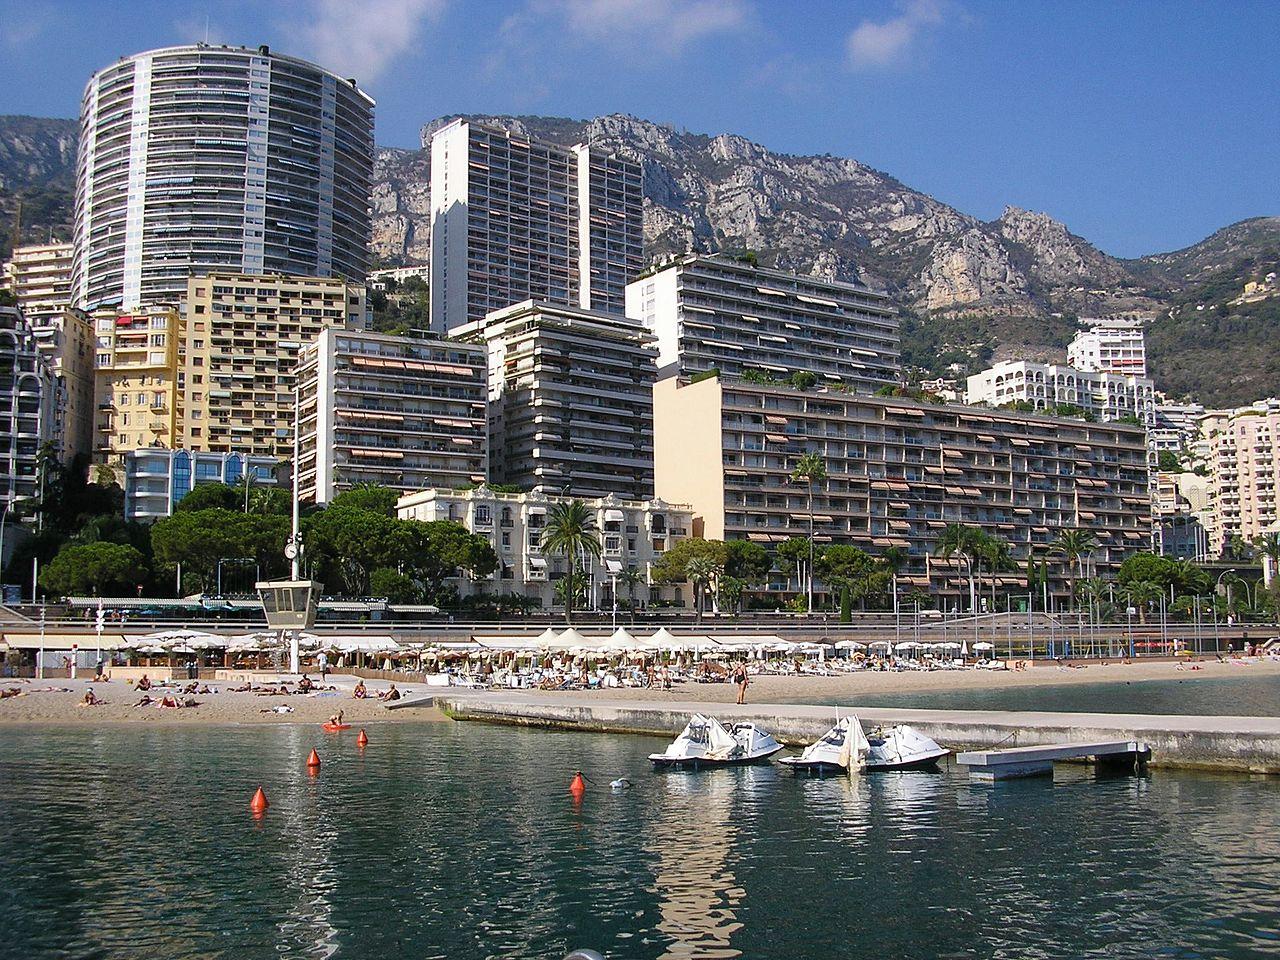 Distrito de Monte Carlo - Mônaco